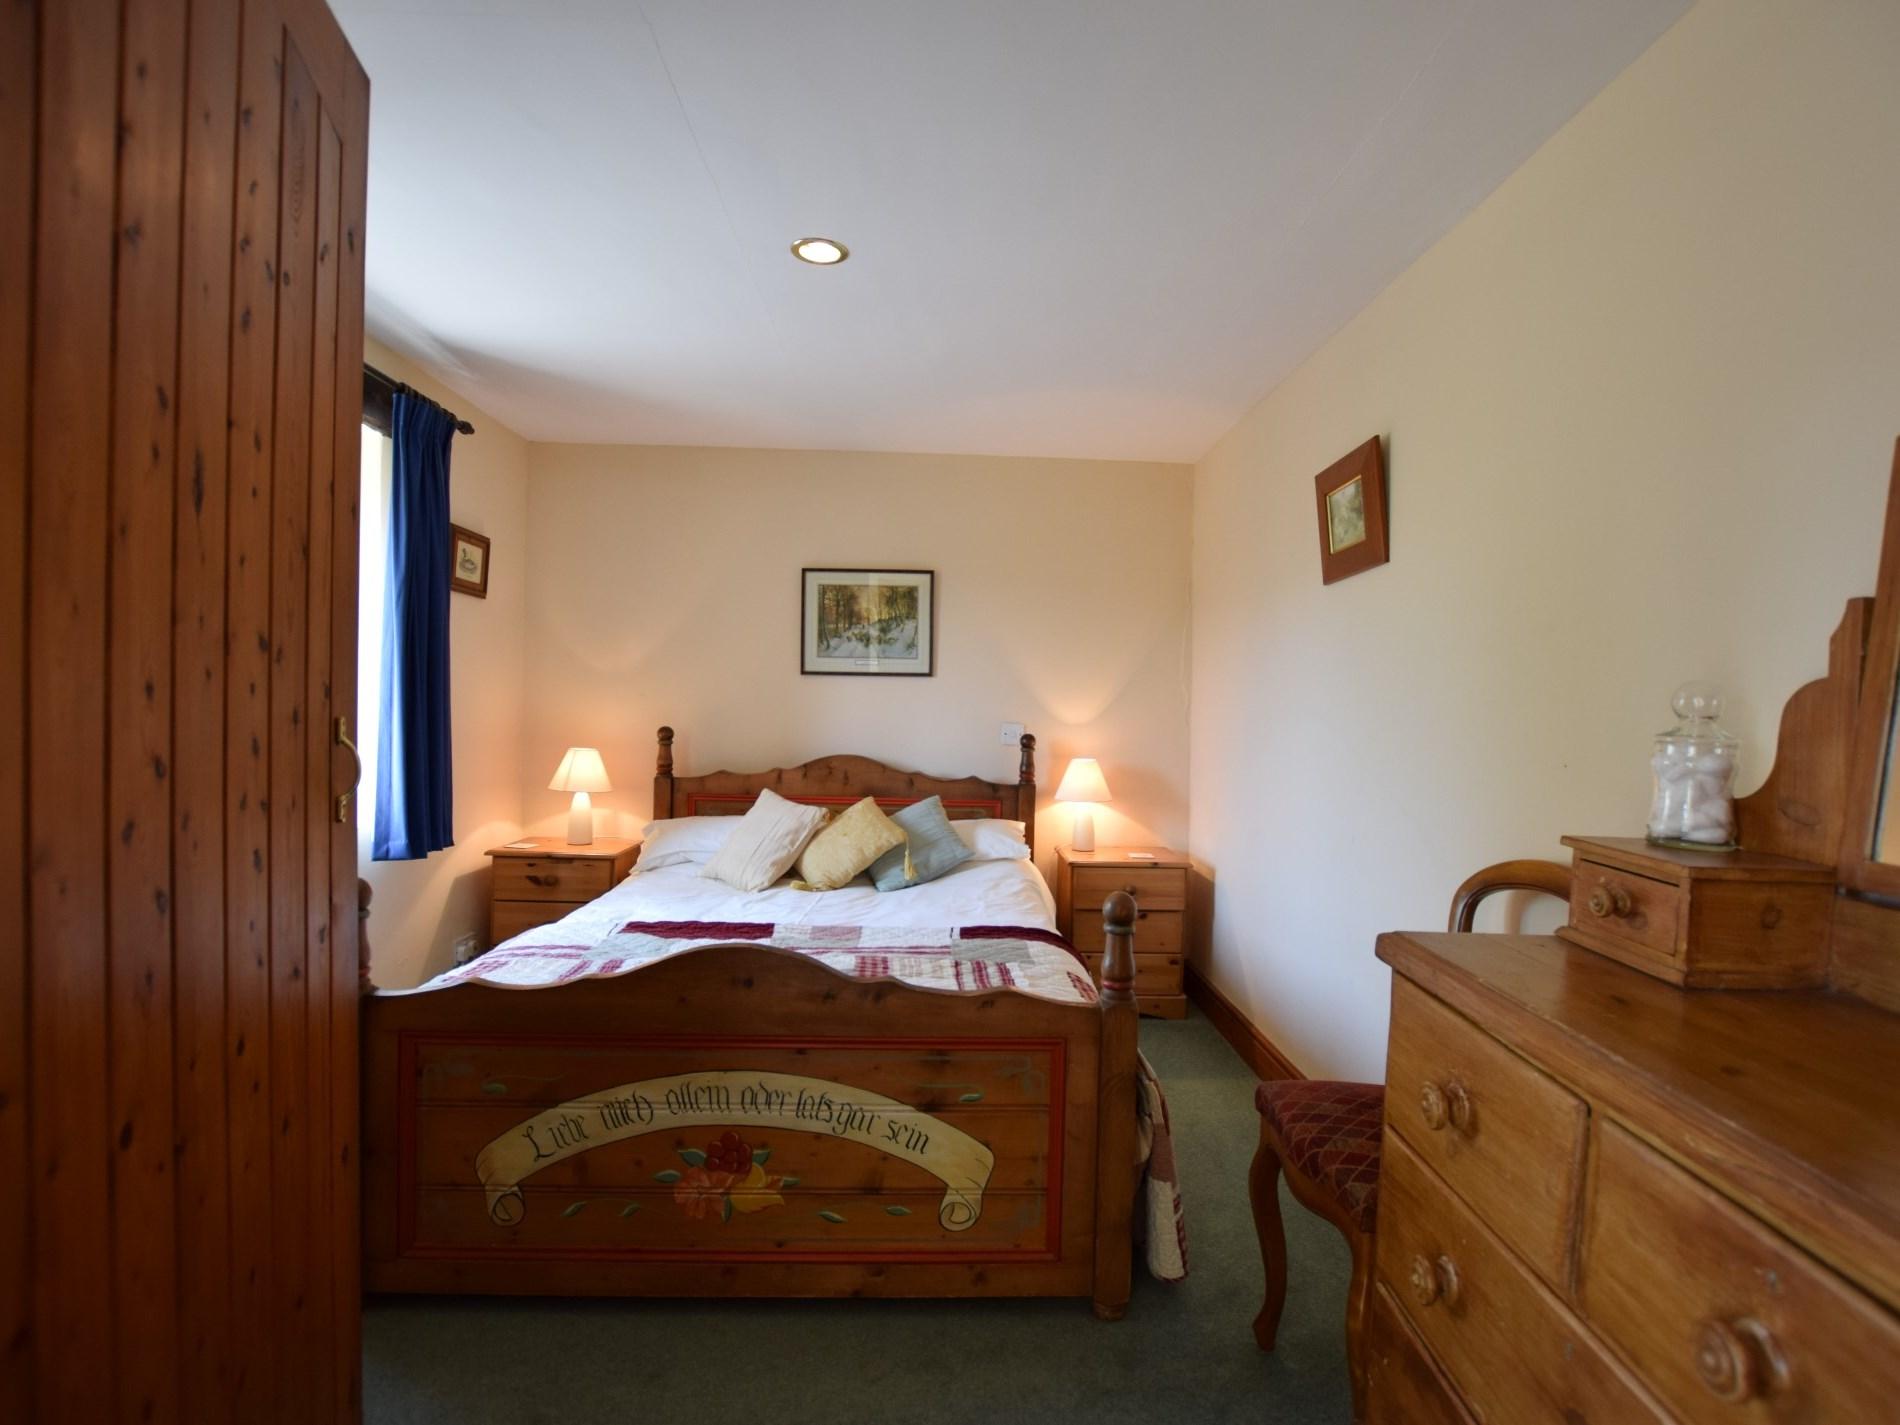 2 Bedroom Cottage in Kirkby Stephen, Scottish Borders